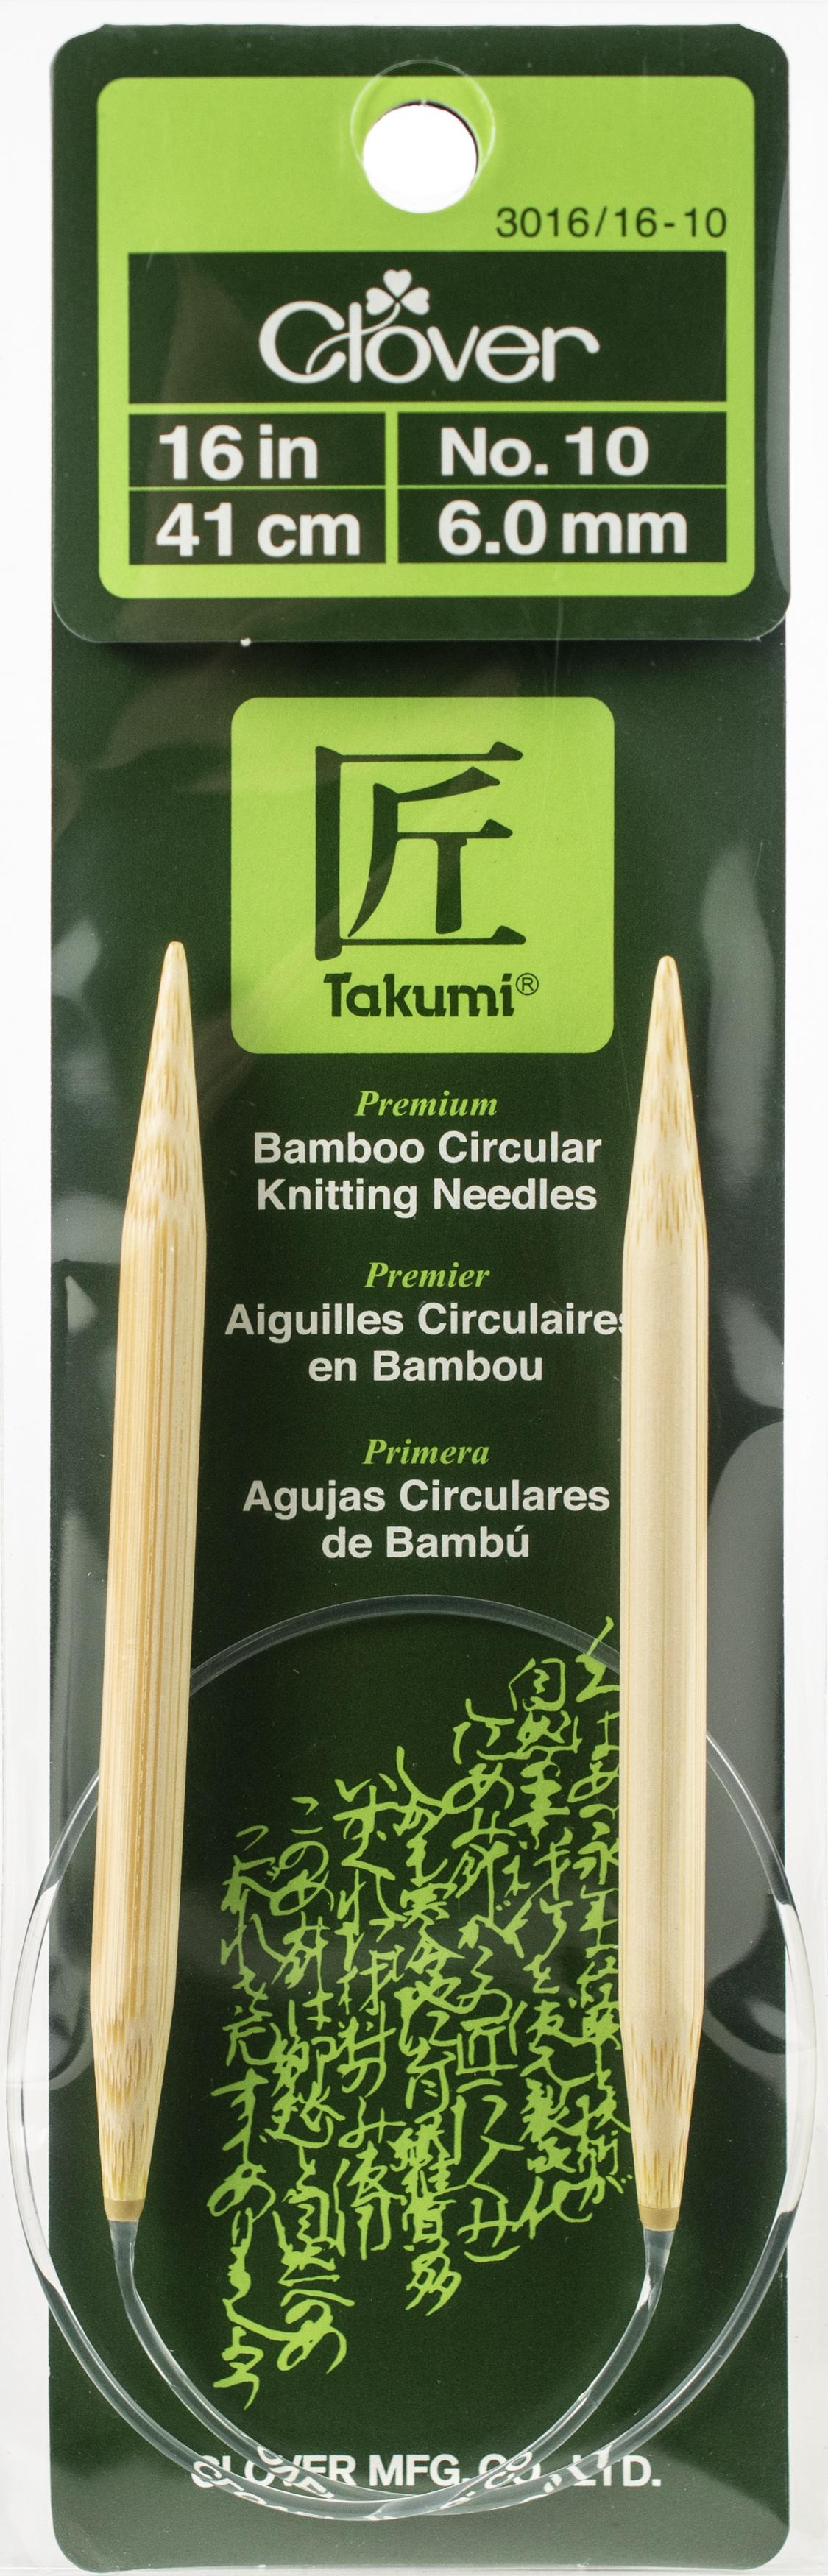 Takumi Bamboo Circular Knitting Needles 16-Size 10/6mm